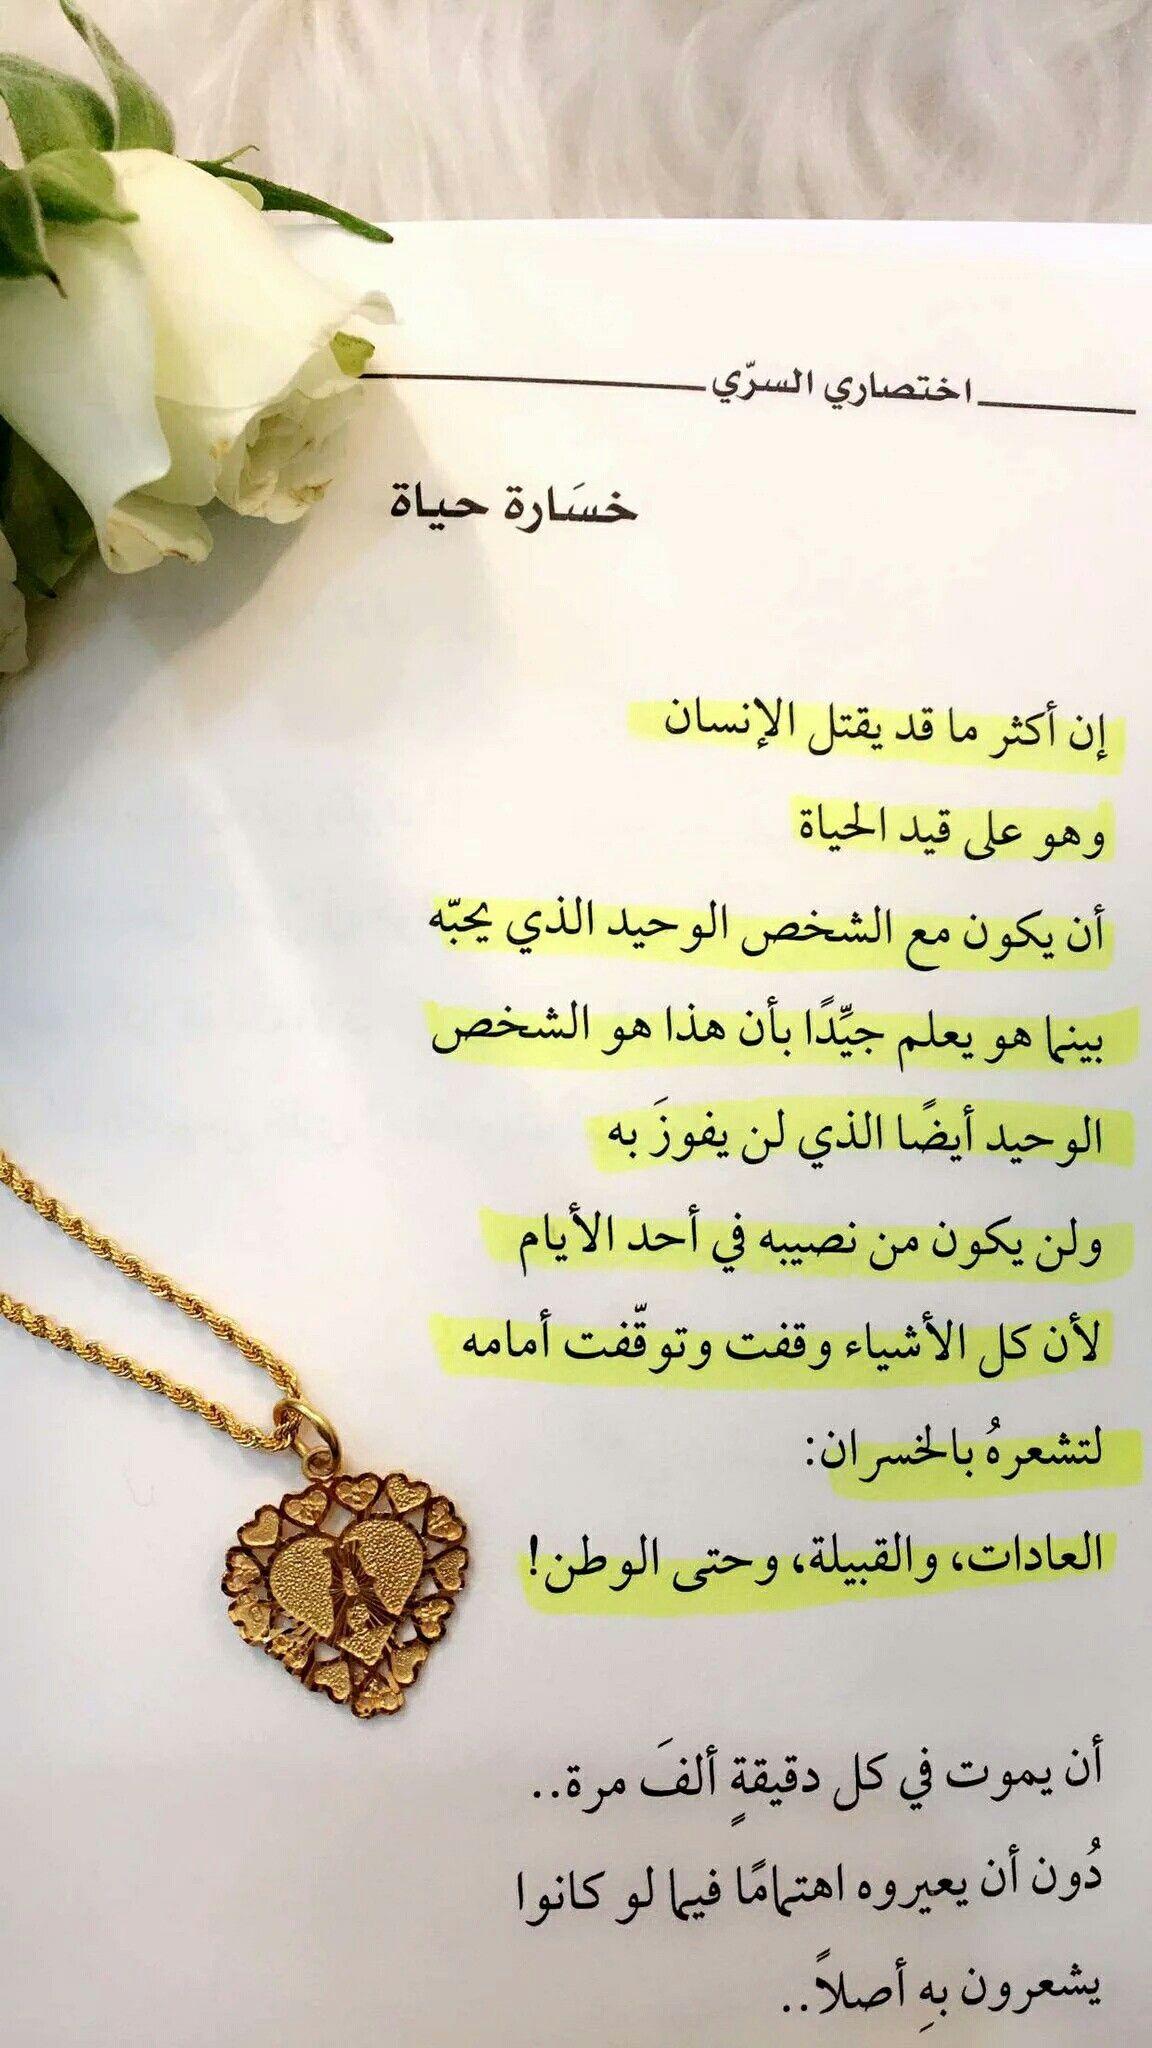 اختصاري السري Cool Words Arabic Love Quotes Love Words